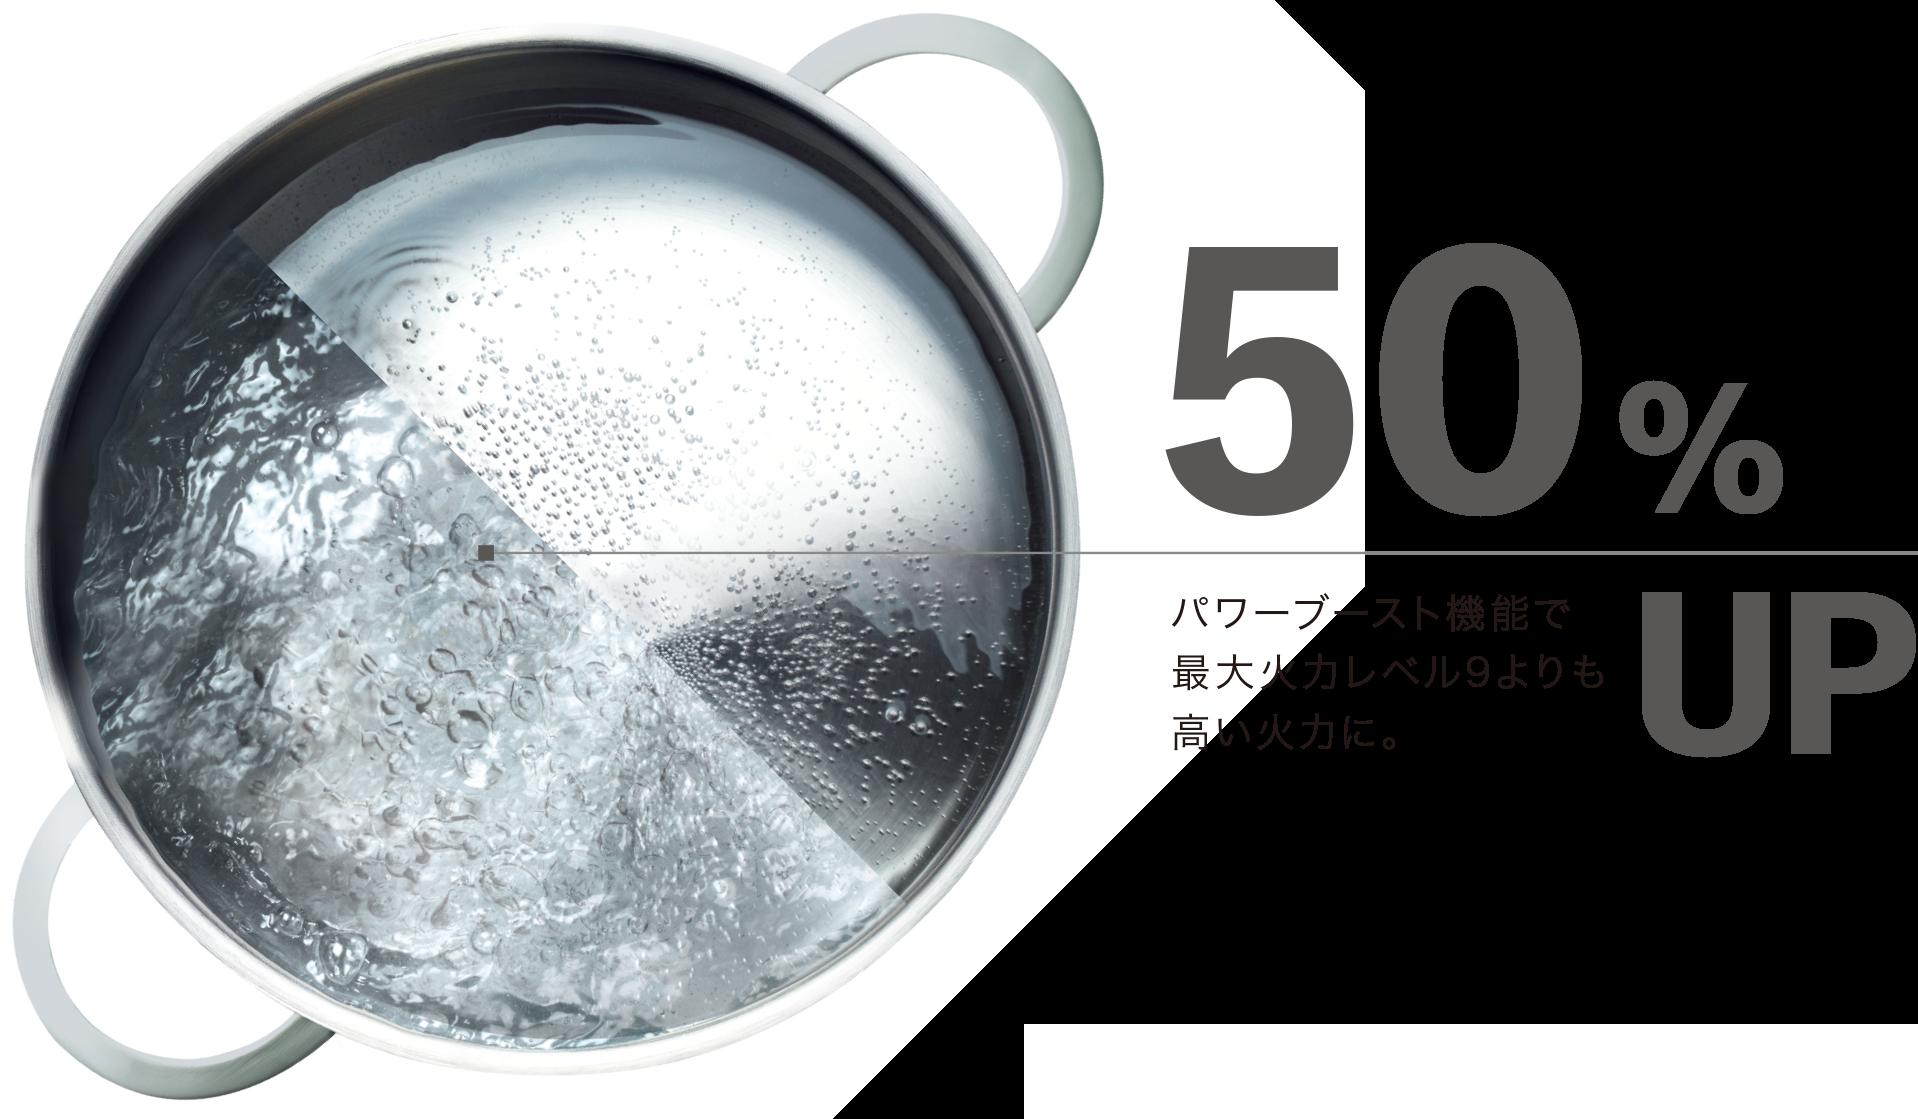 50% up